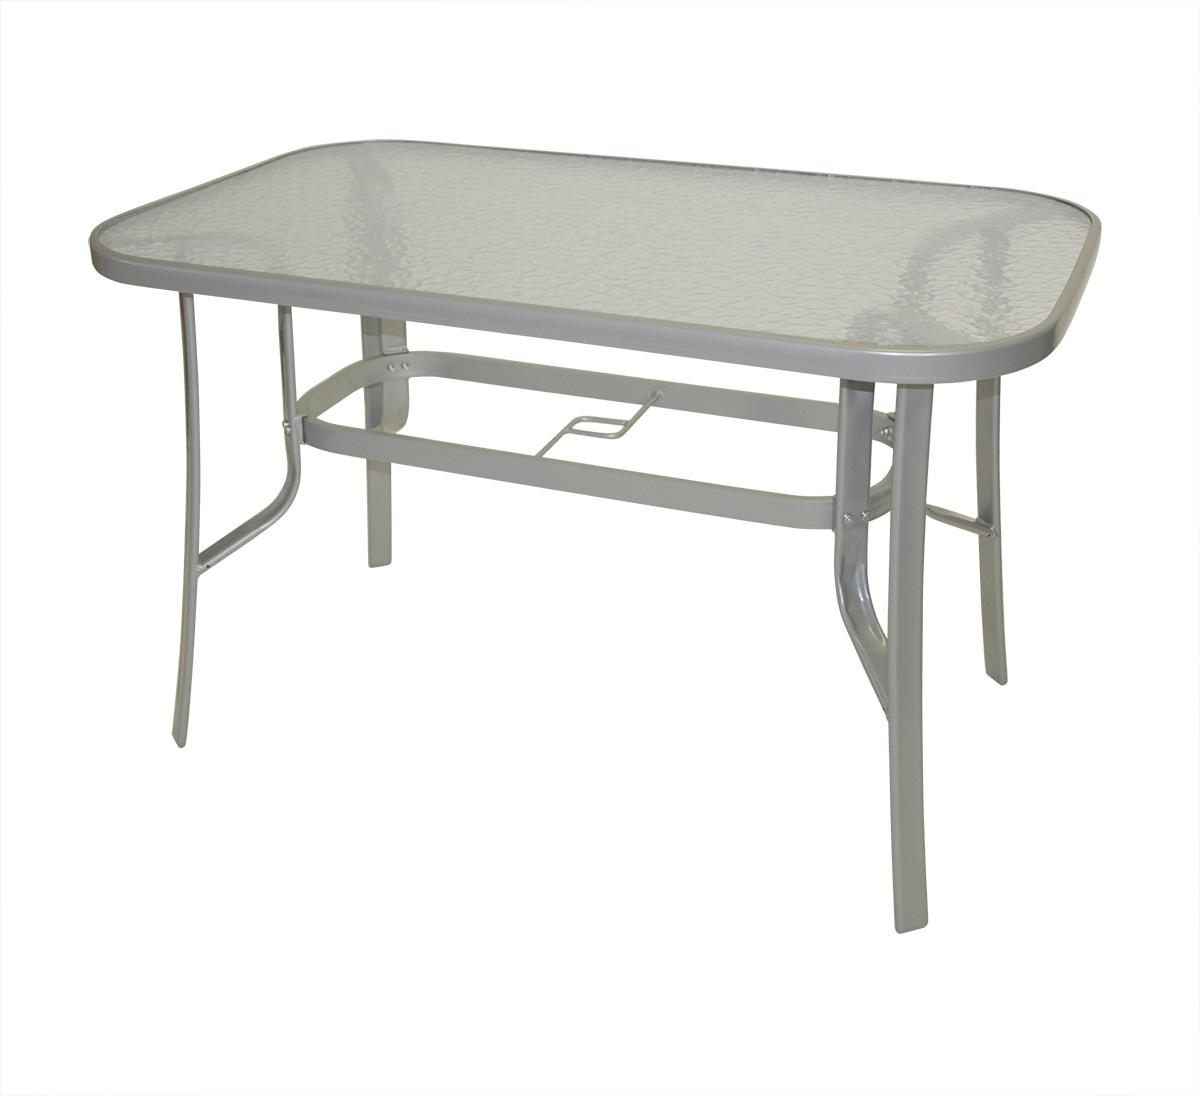 Tisch MILANO 120x70cm, Alu + Glas